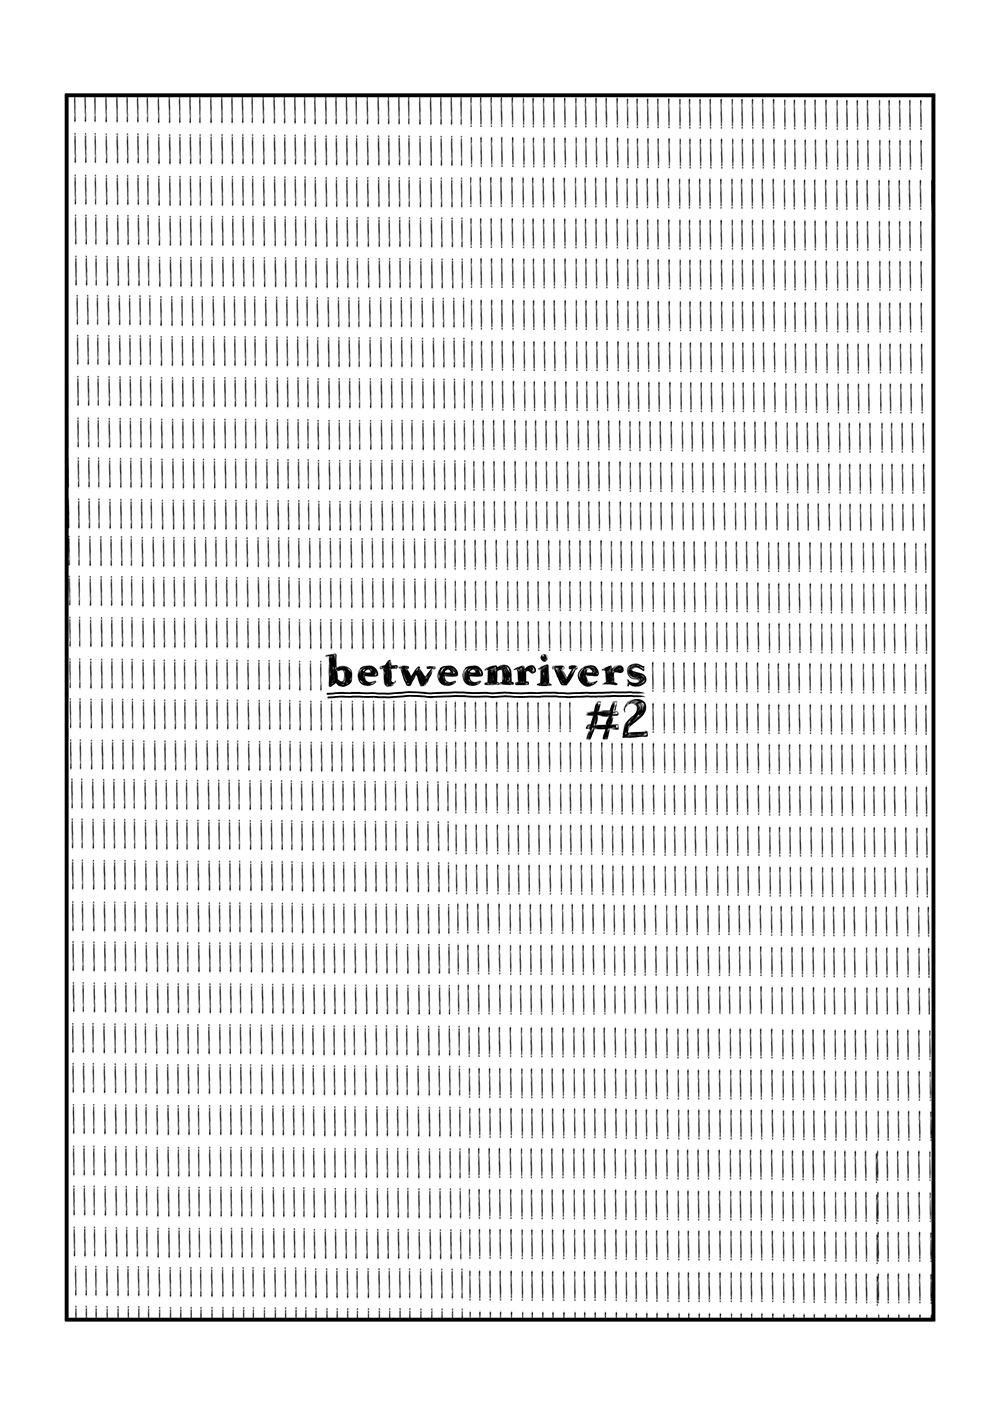 mojowang_illustration_betweenrivers_2_0.jpg